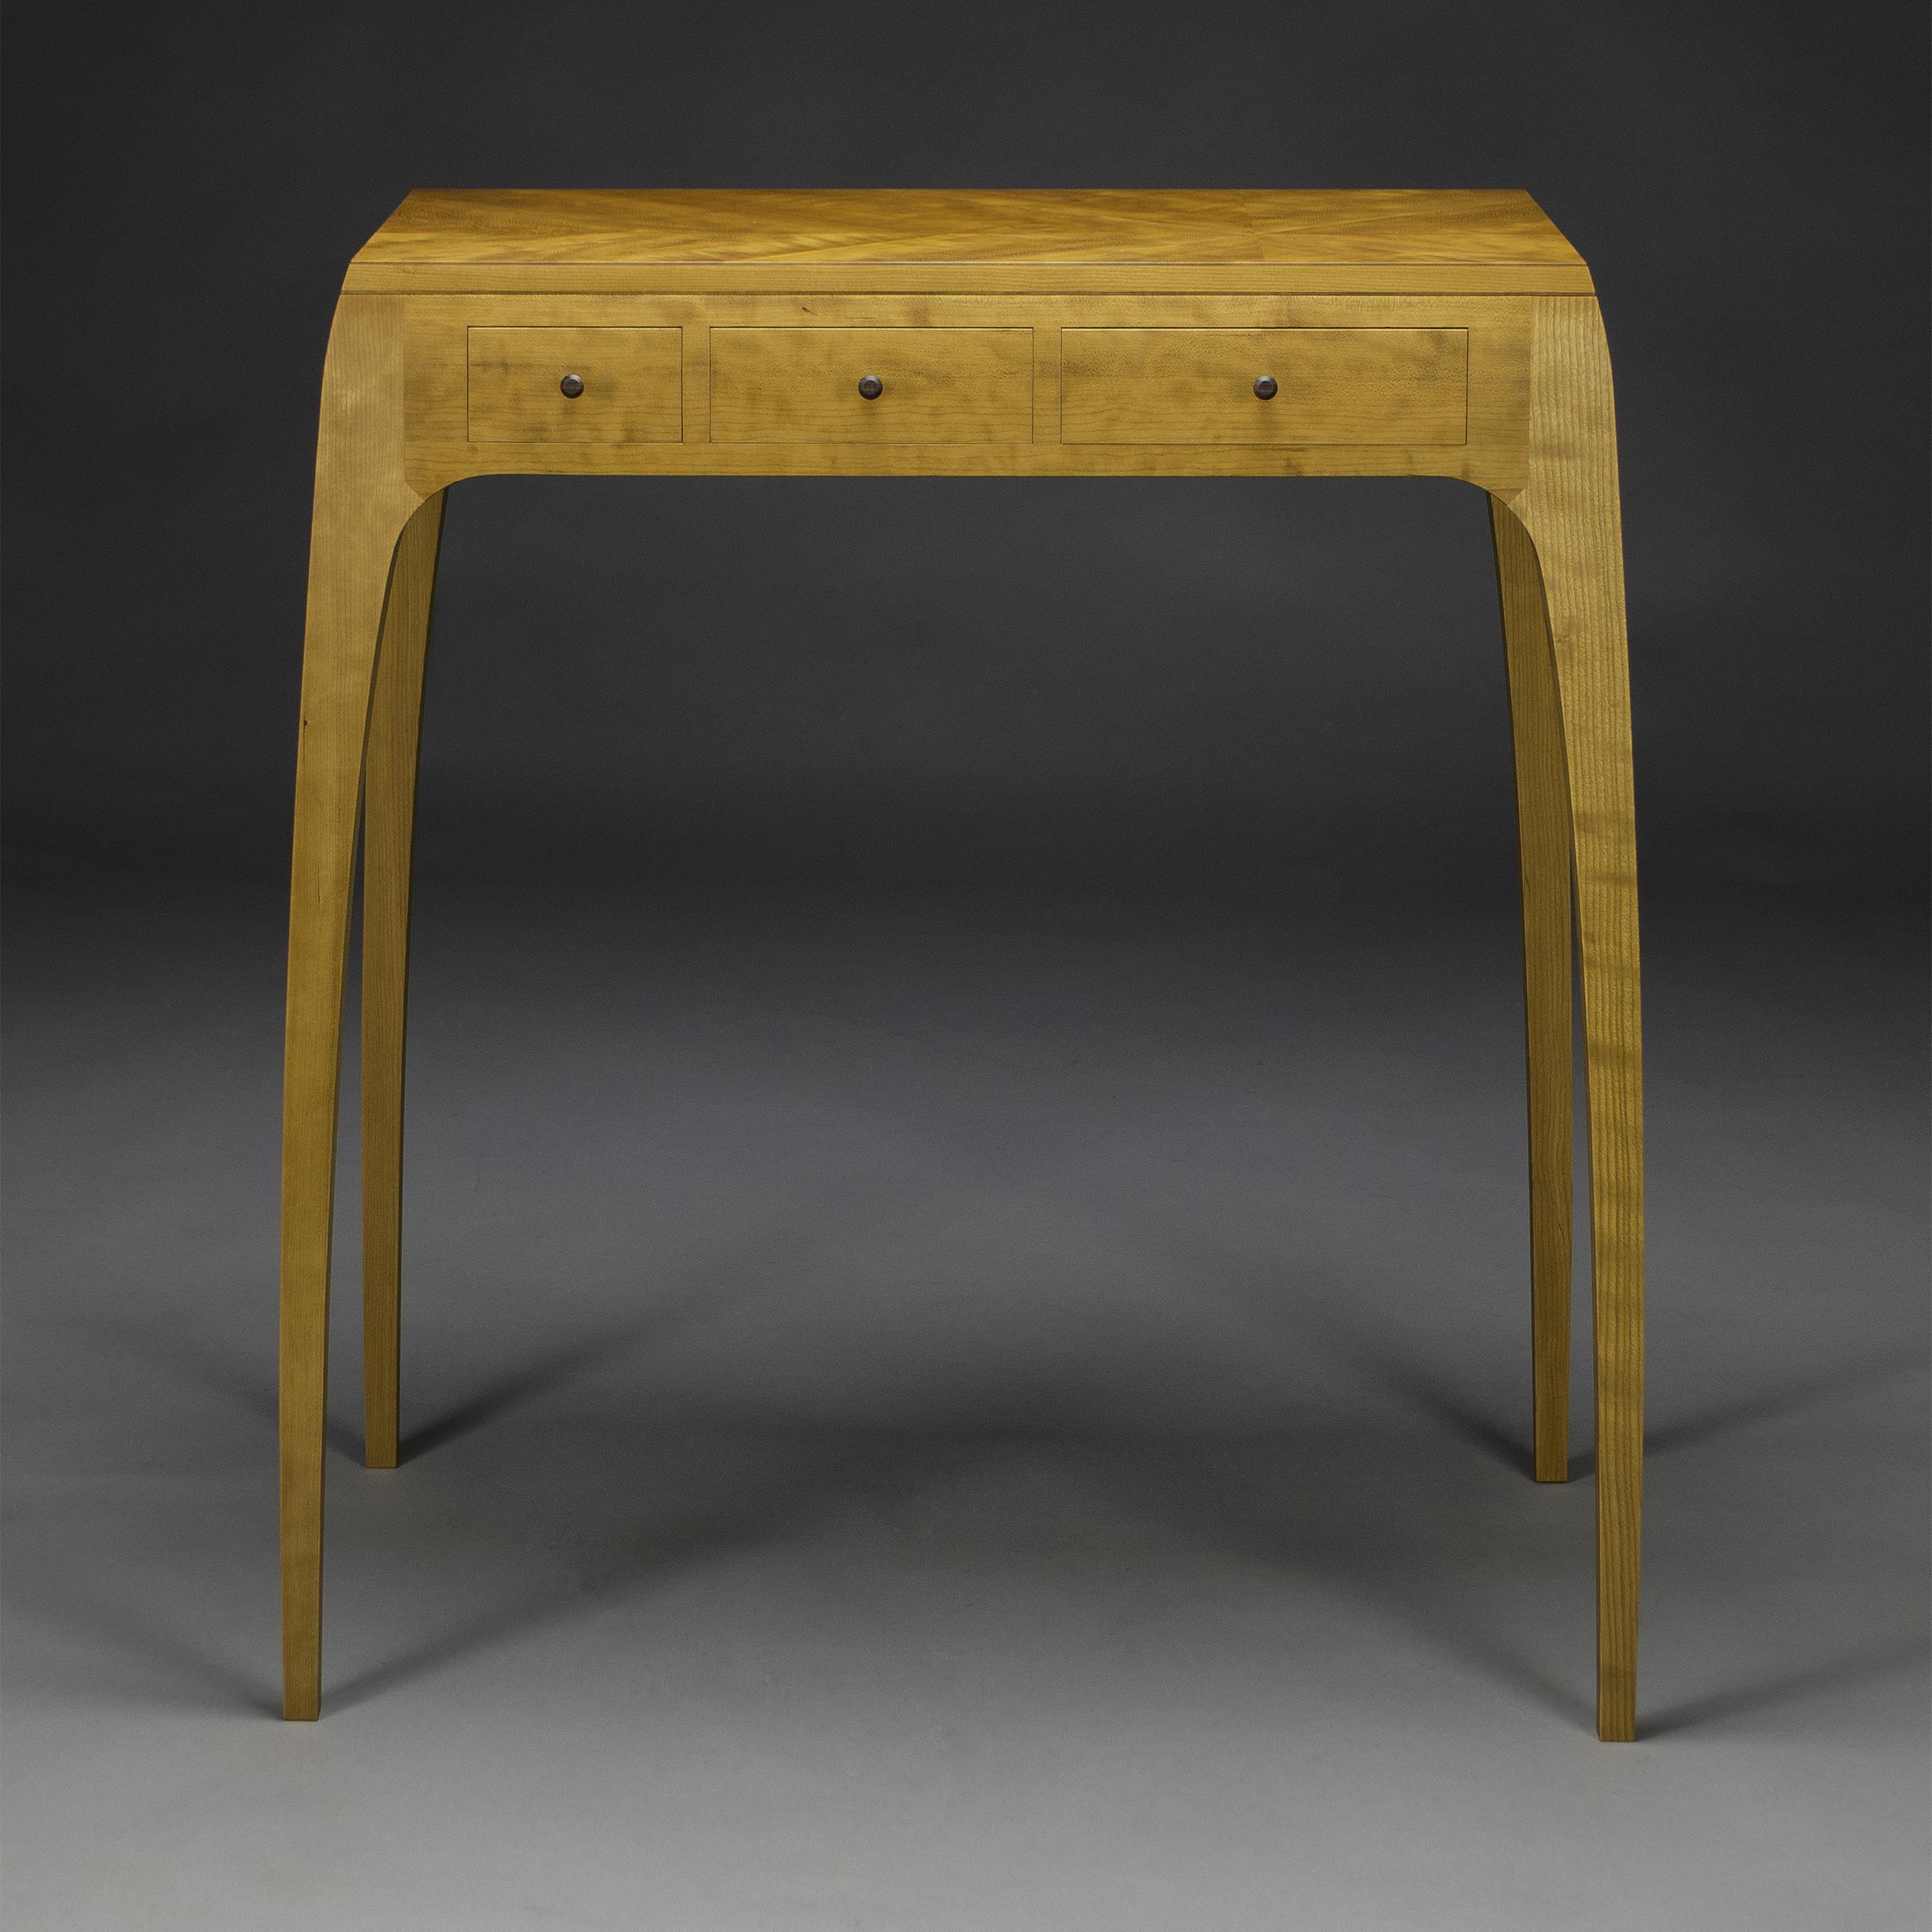 hand shaped side table.jpg